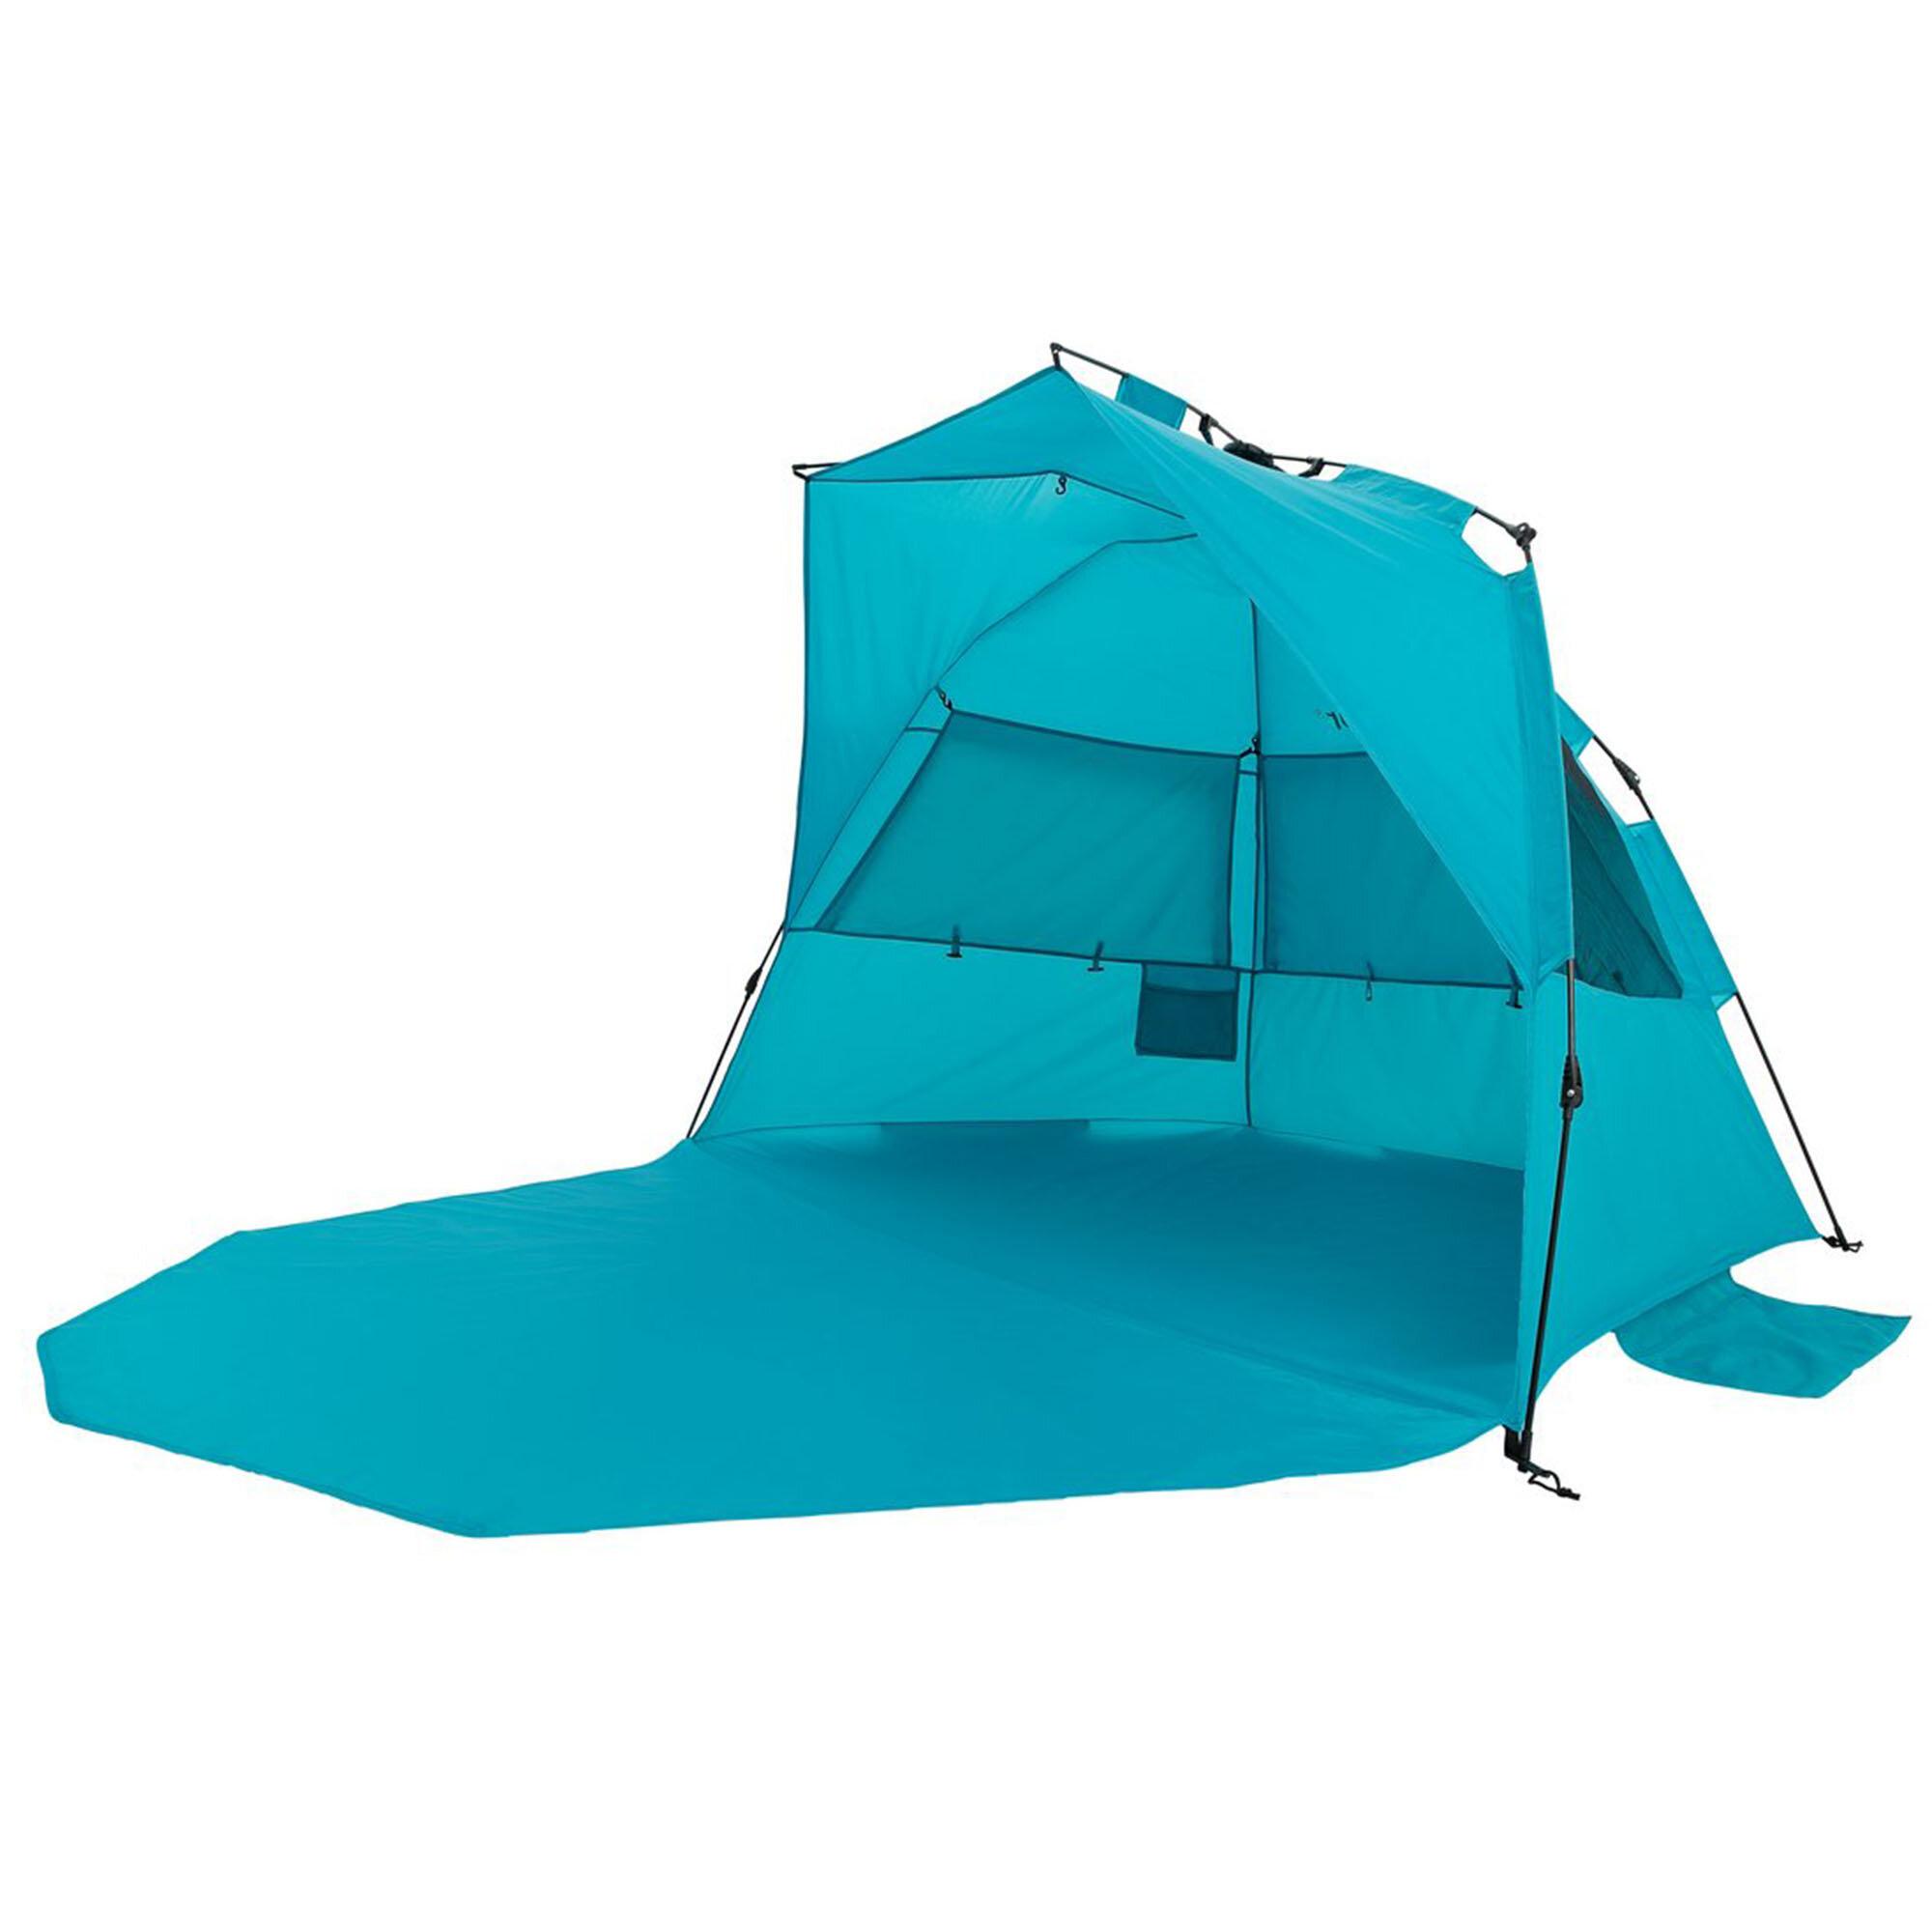 Details about Alvantor Deluxe Seaside 4 Person Tent